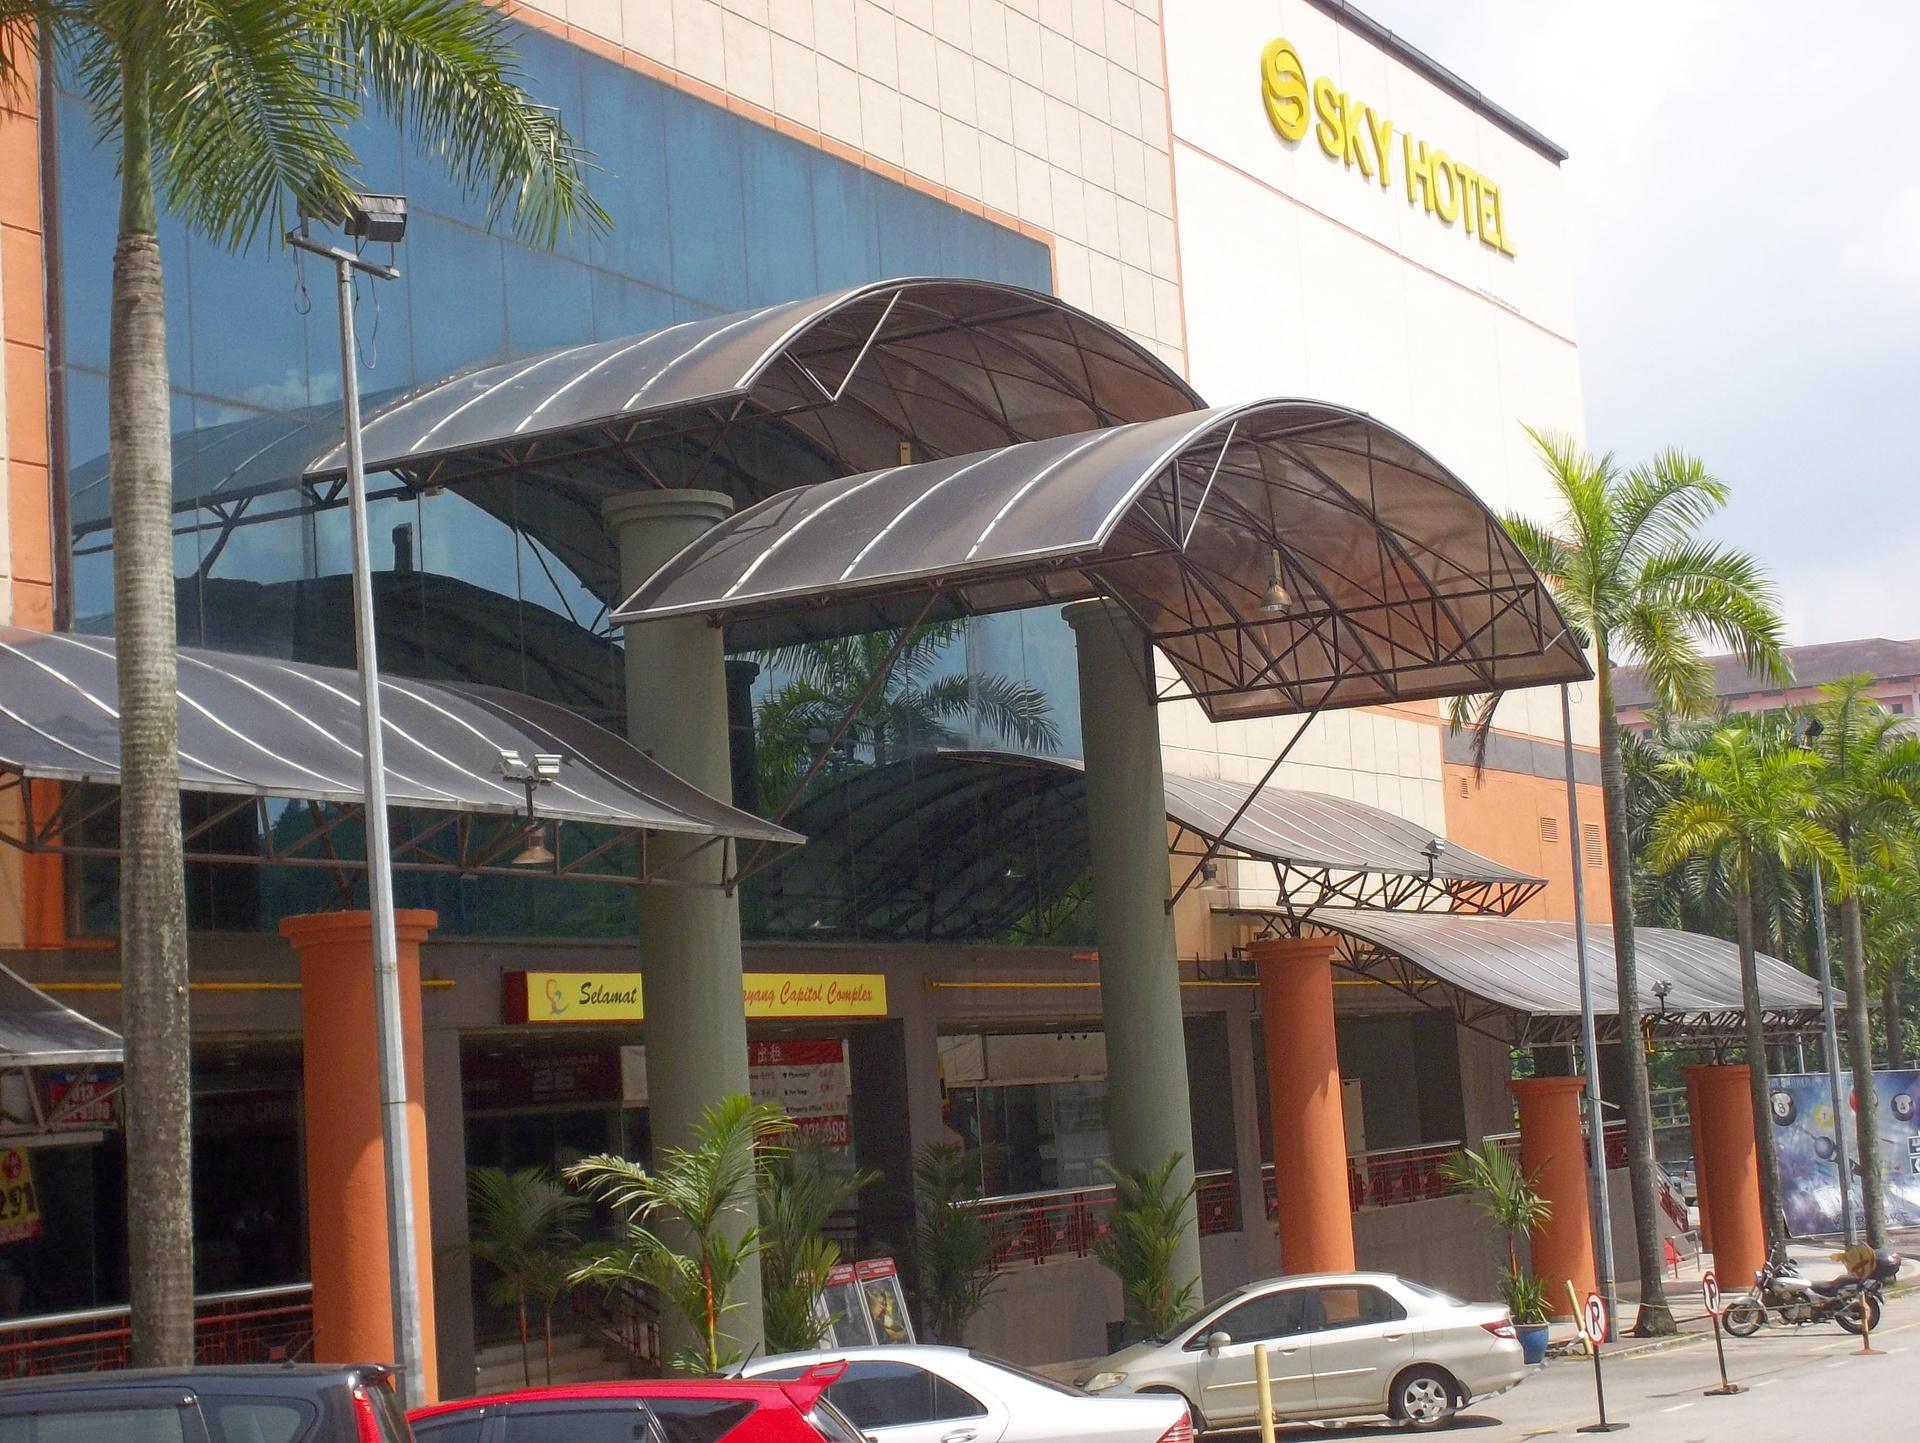 SELAYANG CAPITOL (Sky Hotel @ Selayang), SELAYANG CAPITOL , Lebuhraya Selayang - Kepong , , 68100 Batu Caves, Selangor, Batu Caves, Selangor, 68100, Malaysia